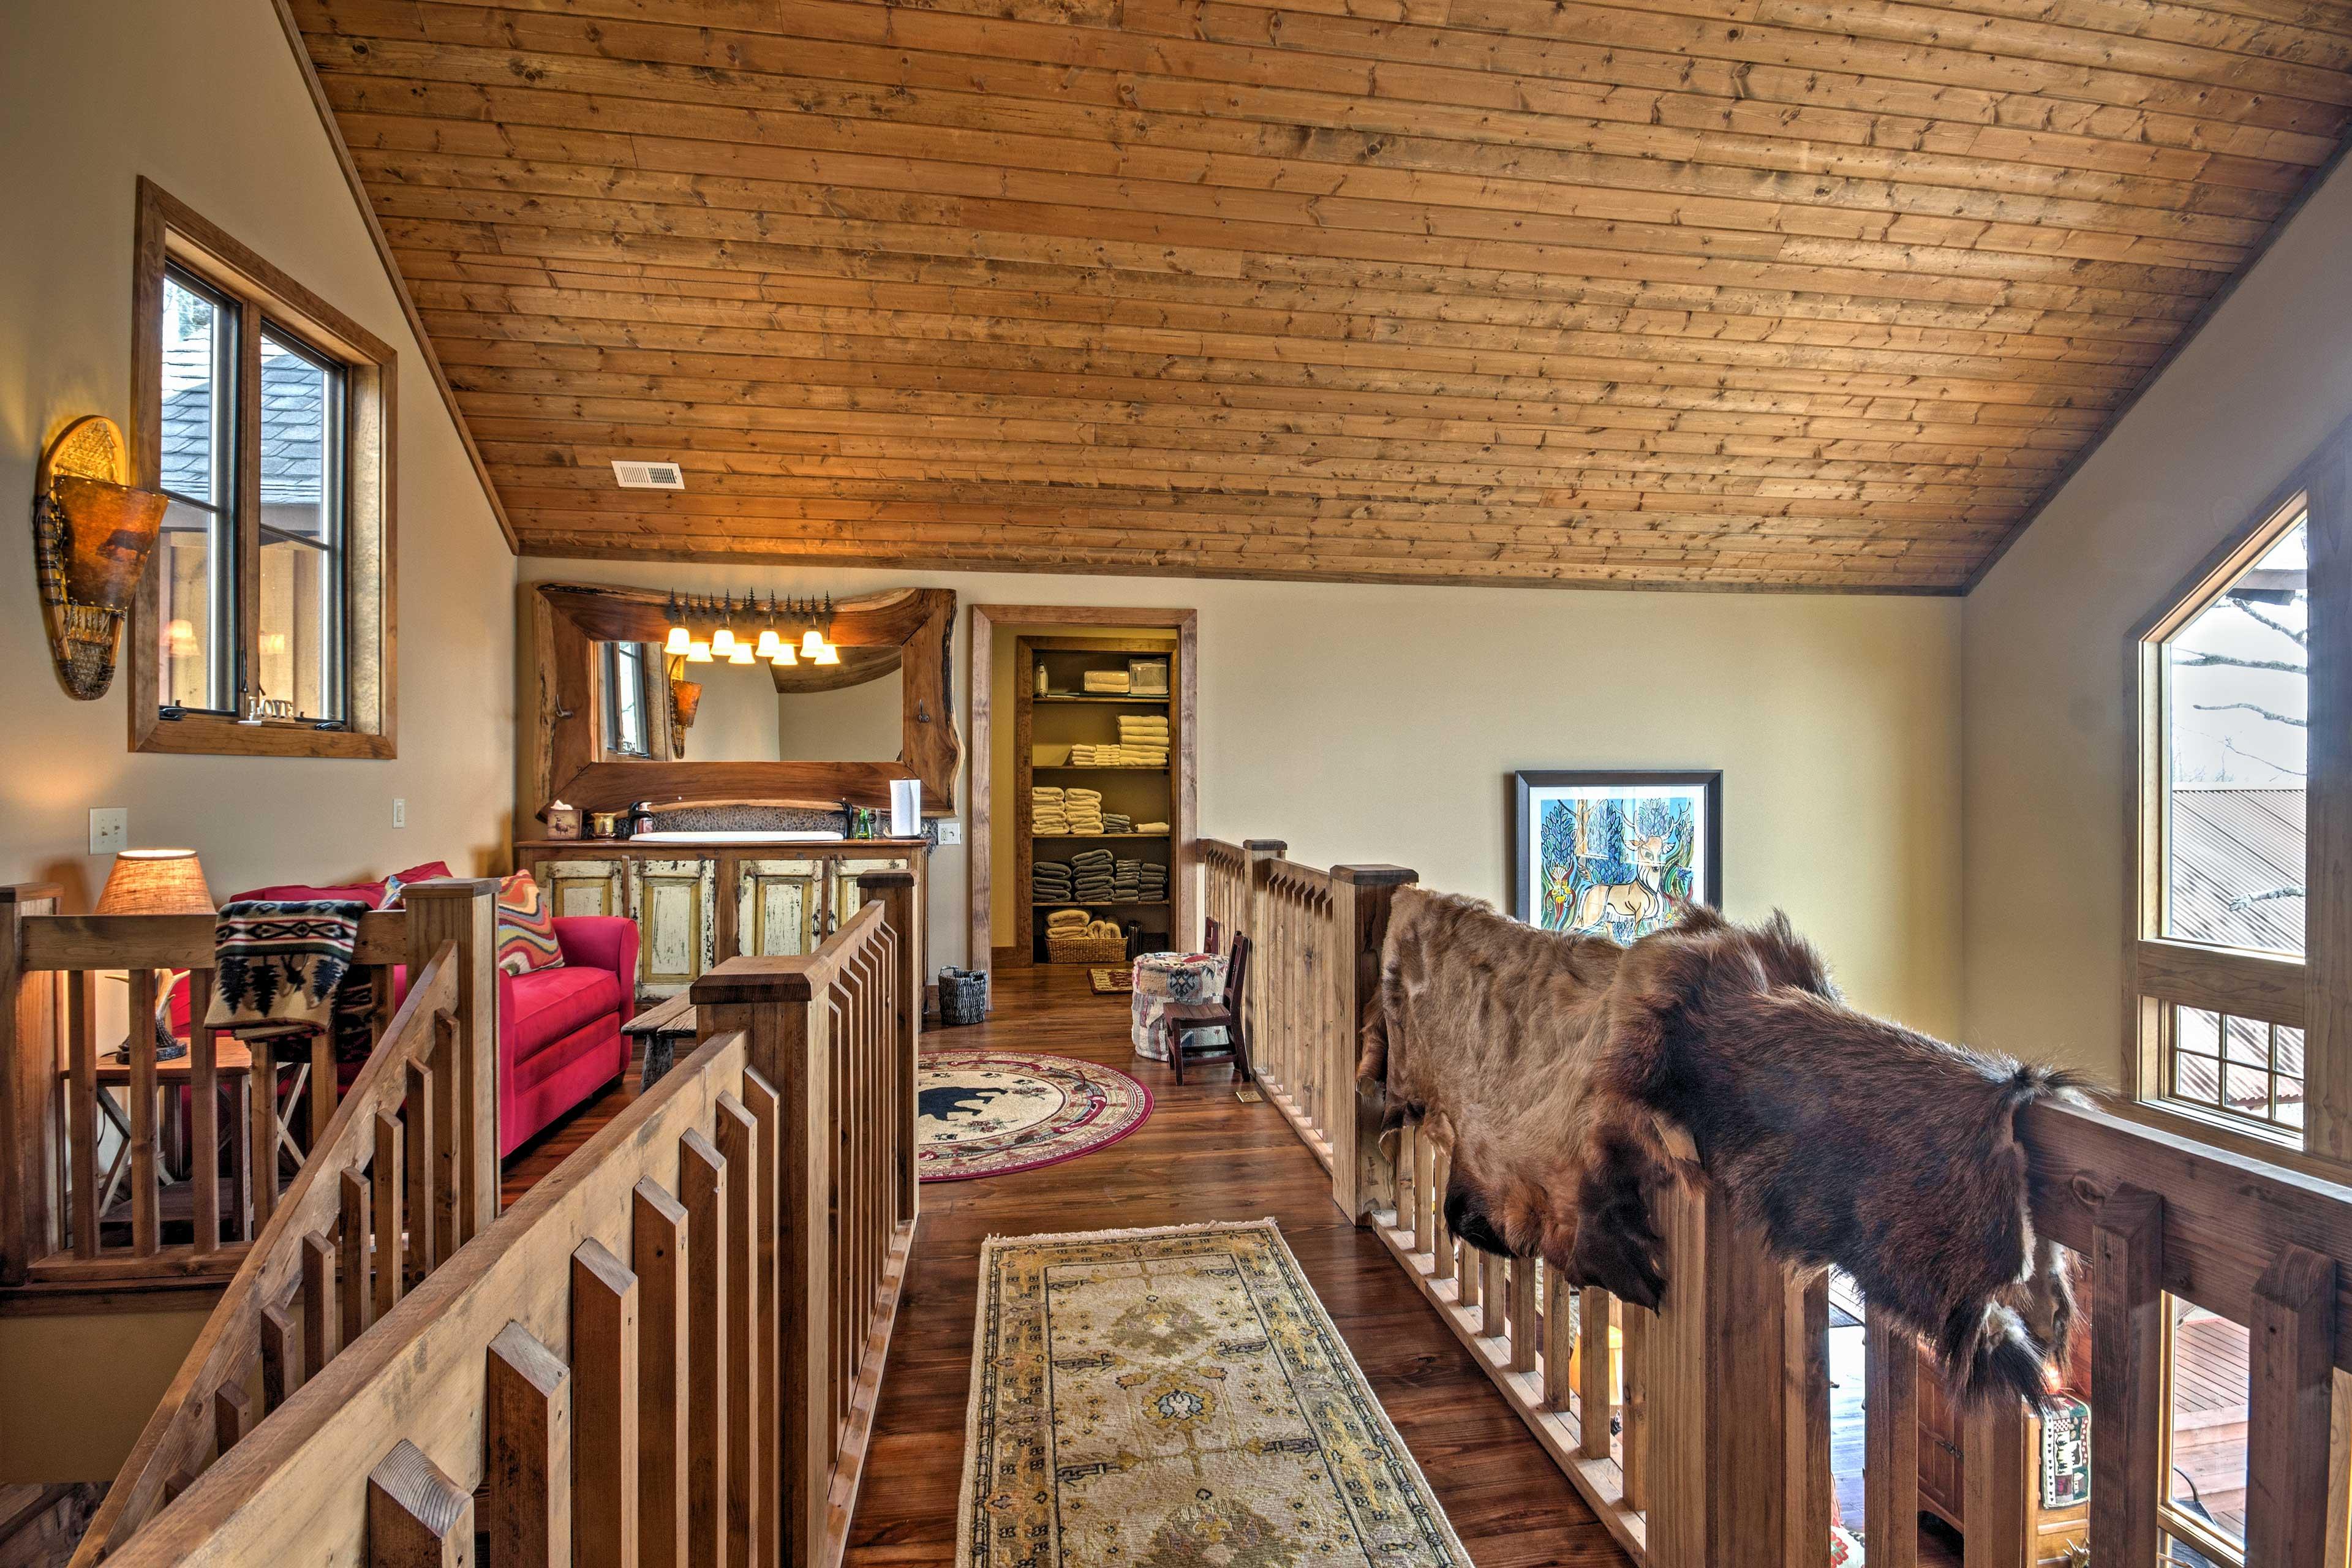 Mountain decor elevates this stunning home.